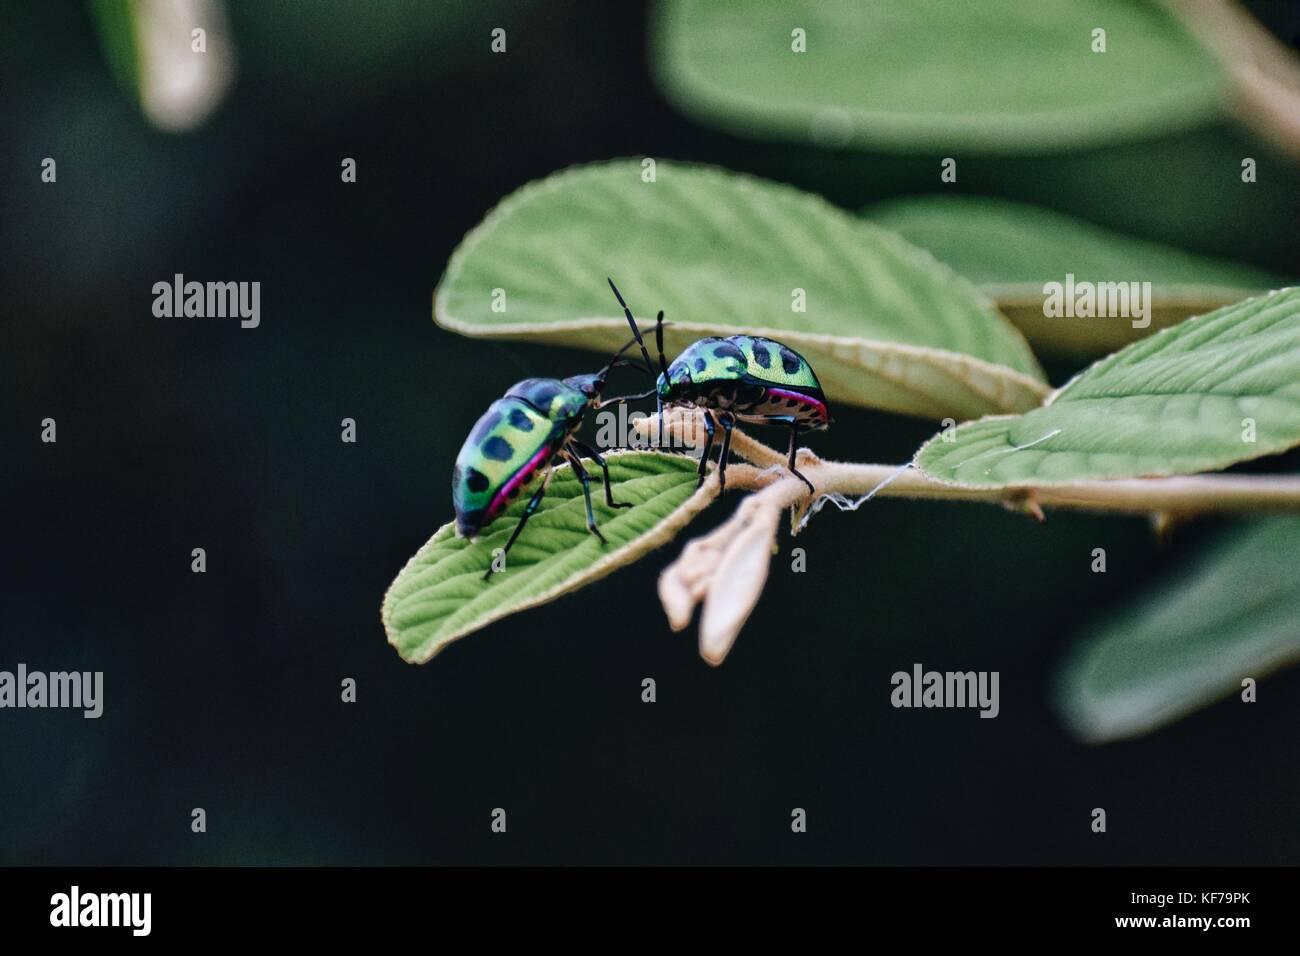 Love Bugs - Stock Image